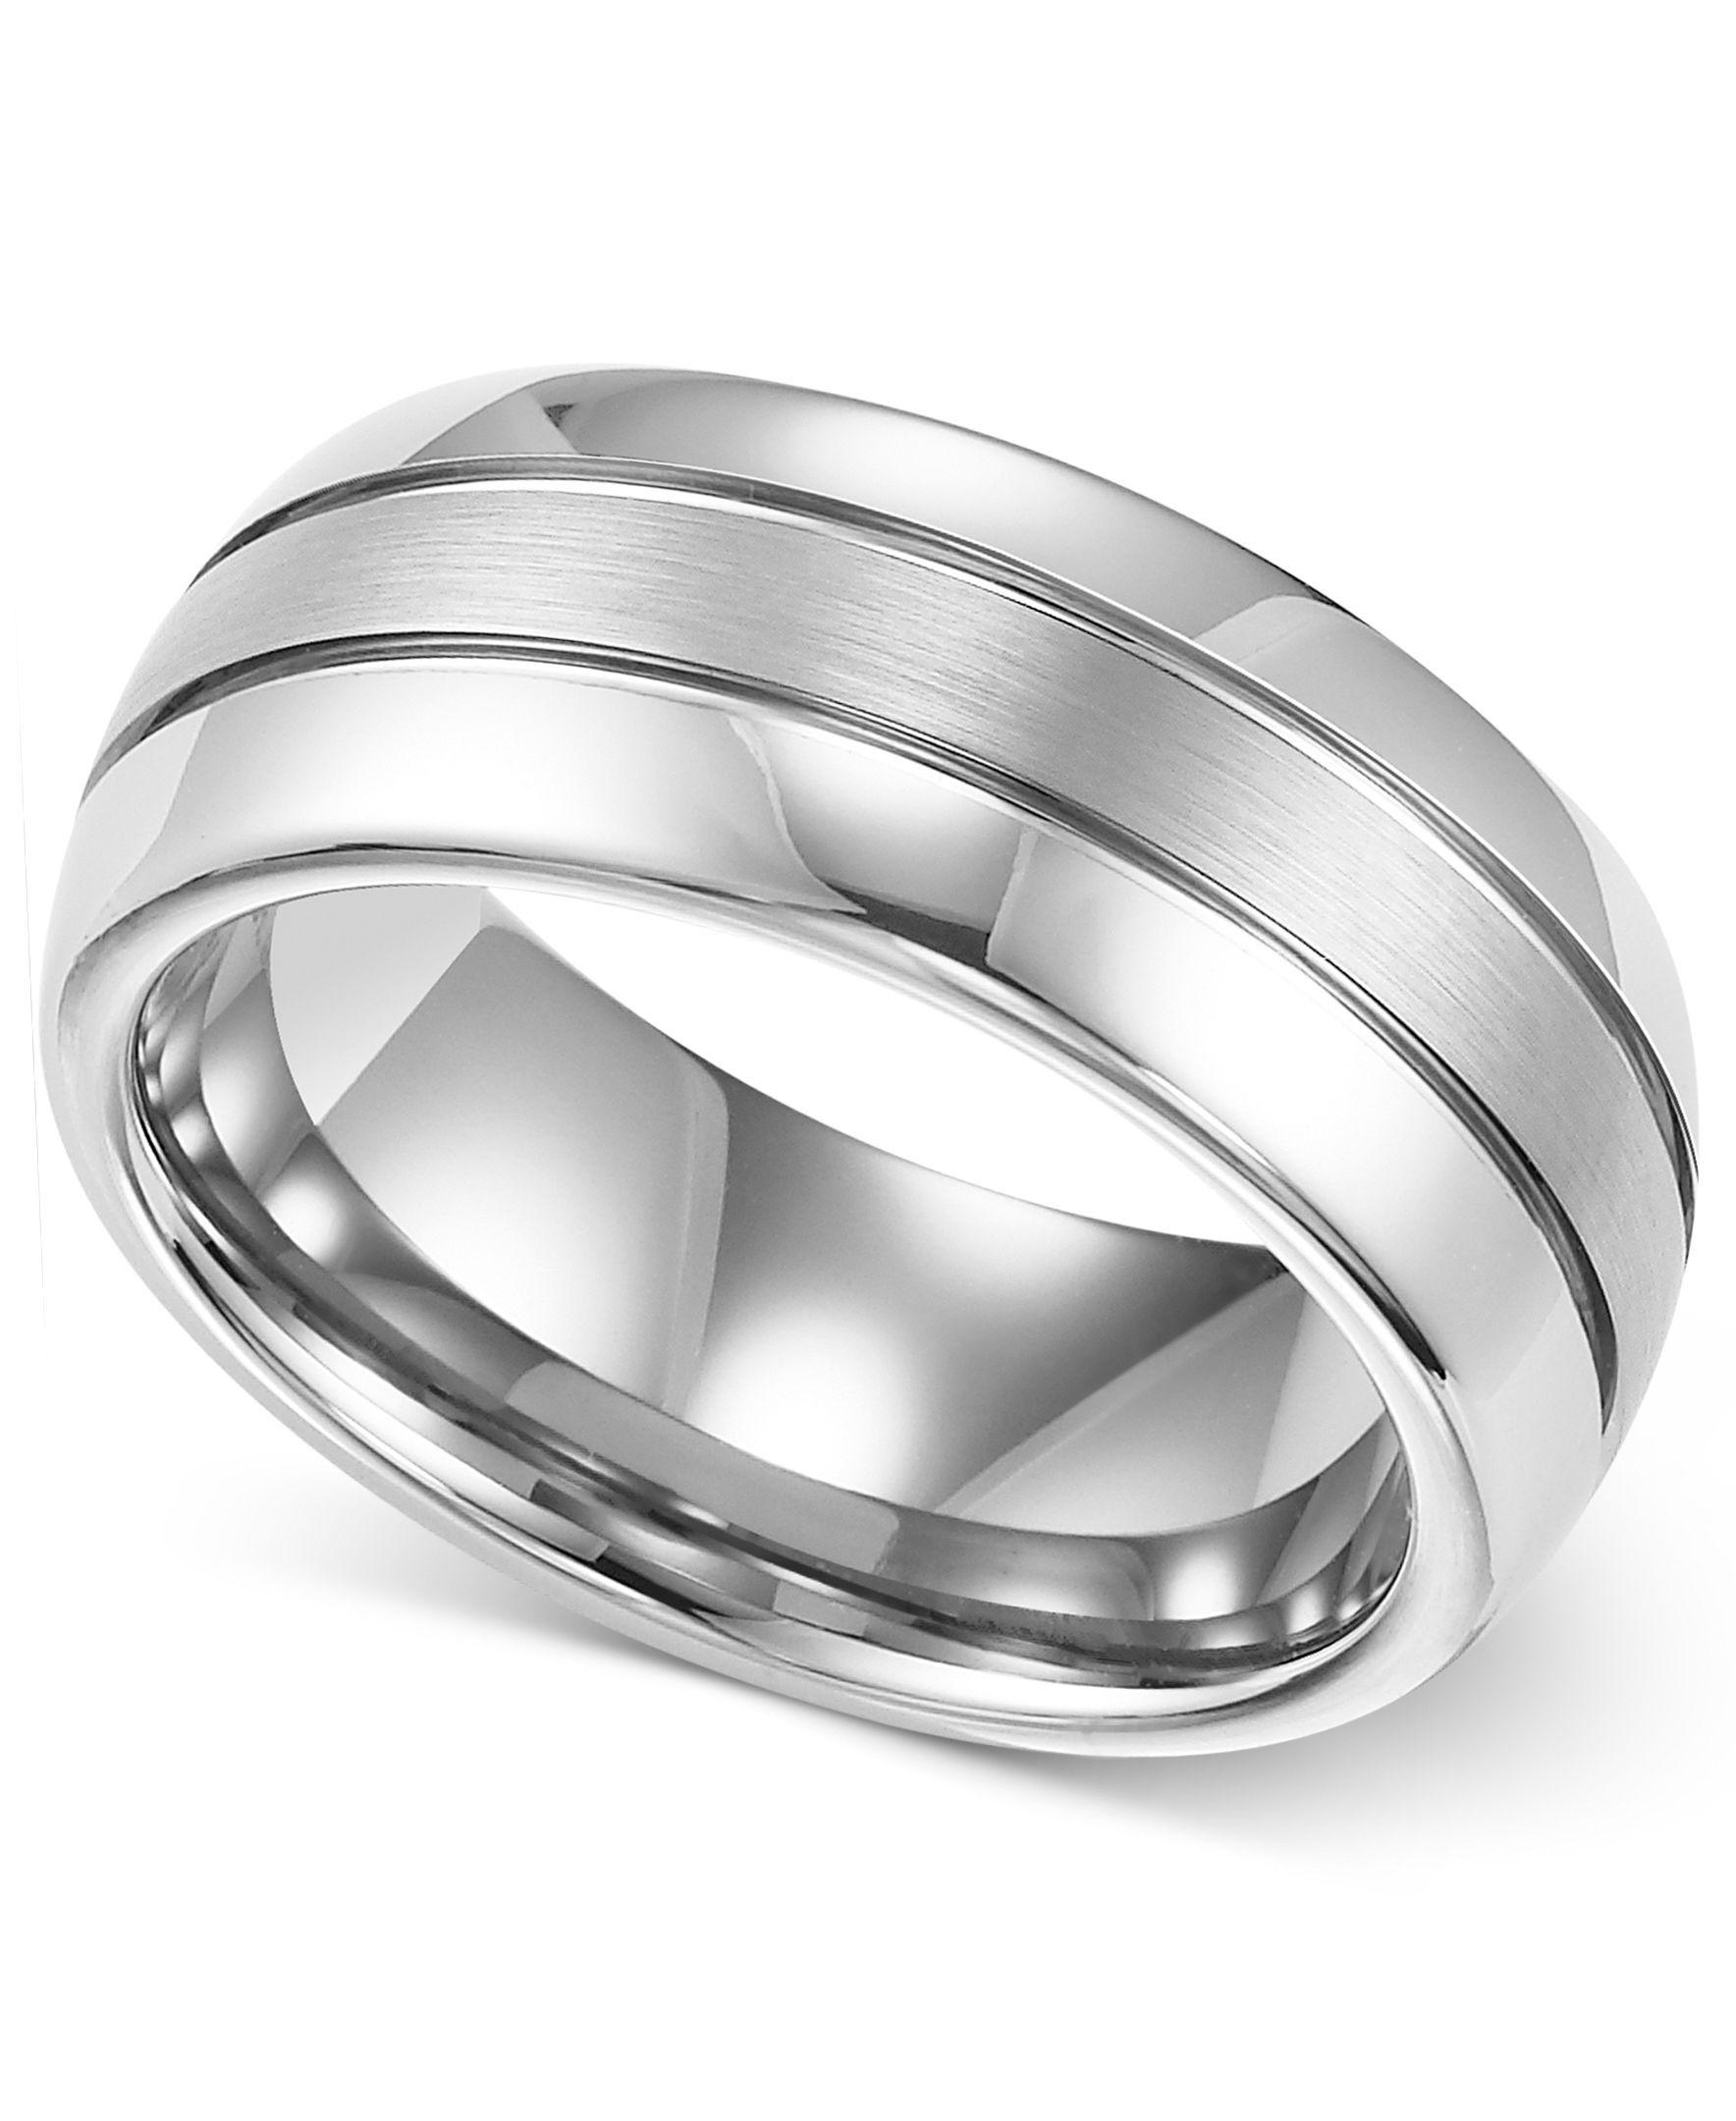 Triton Men's Ring, 8mm White Tungsten 3Row Wedding Band